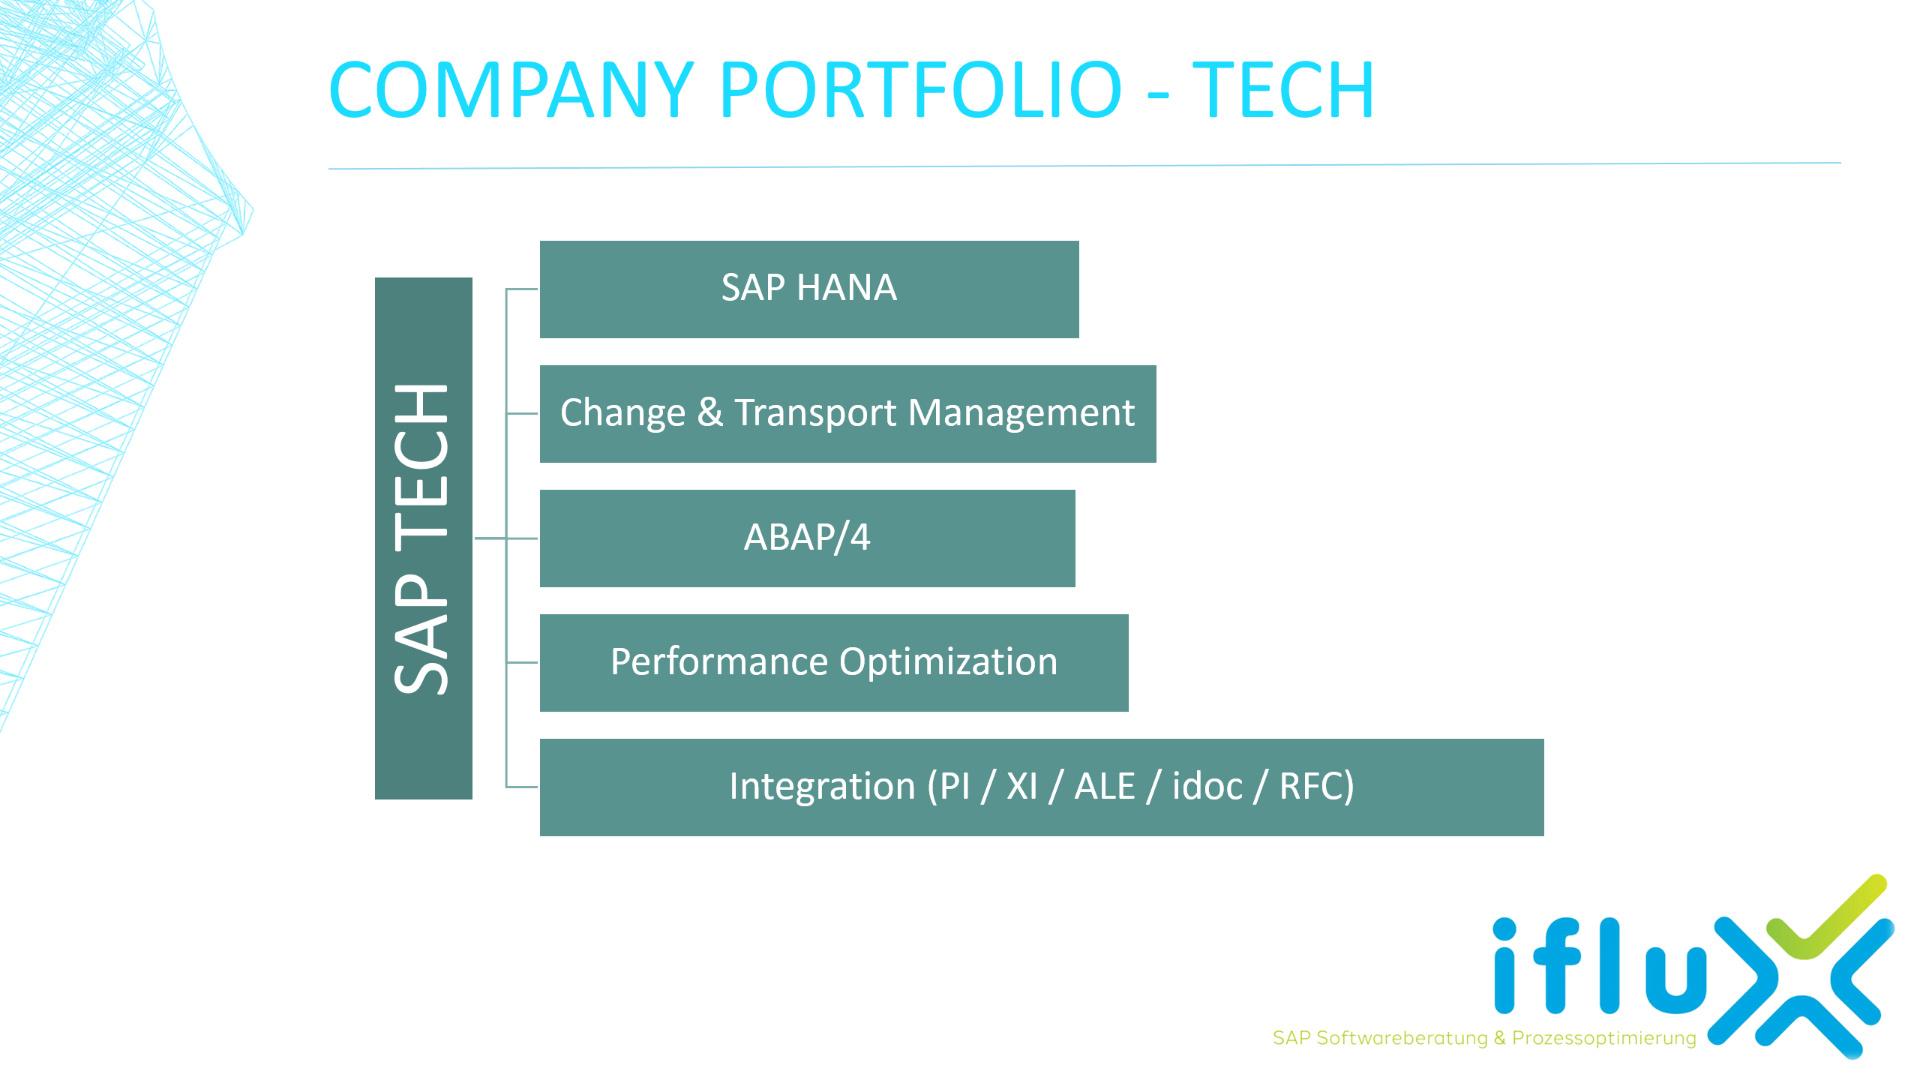 Portfolio - IT & SAP Technology